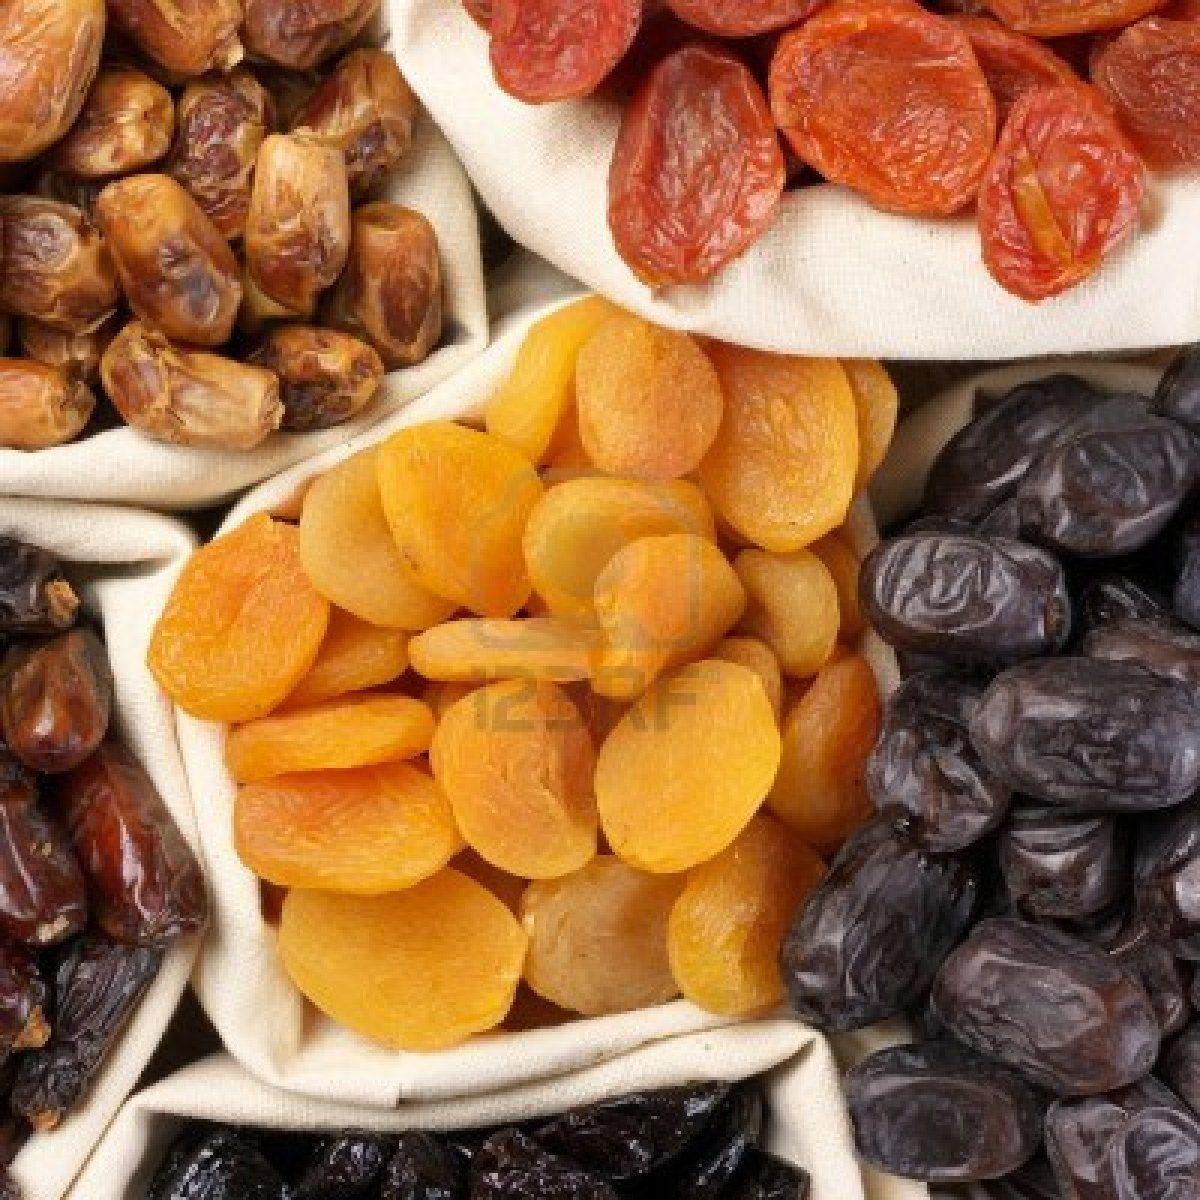 Stock Photo Food, Foods to avoid, Kidney healthy foods